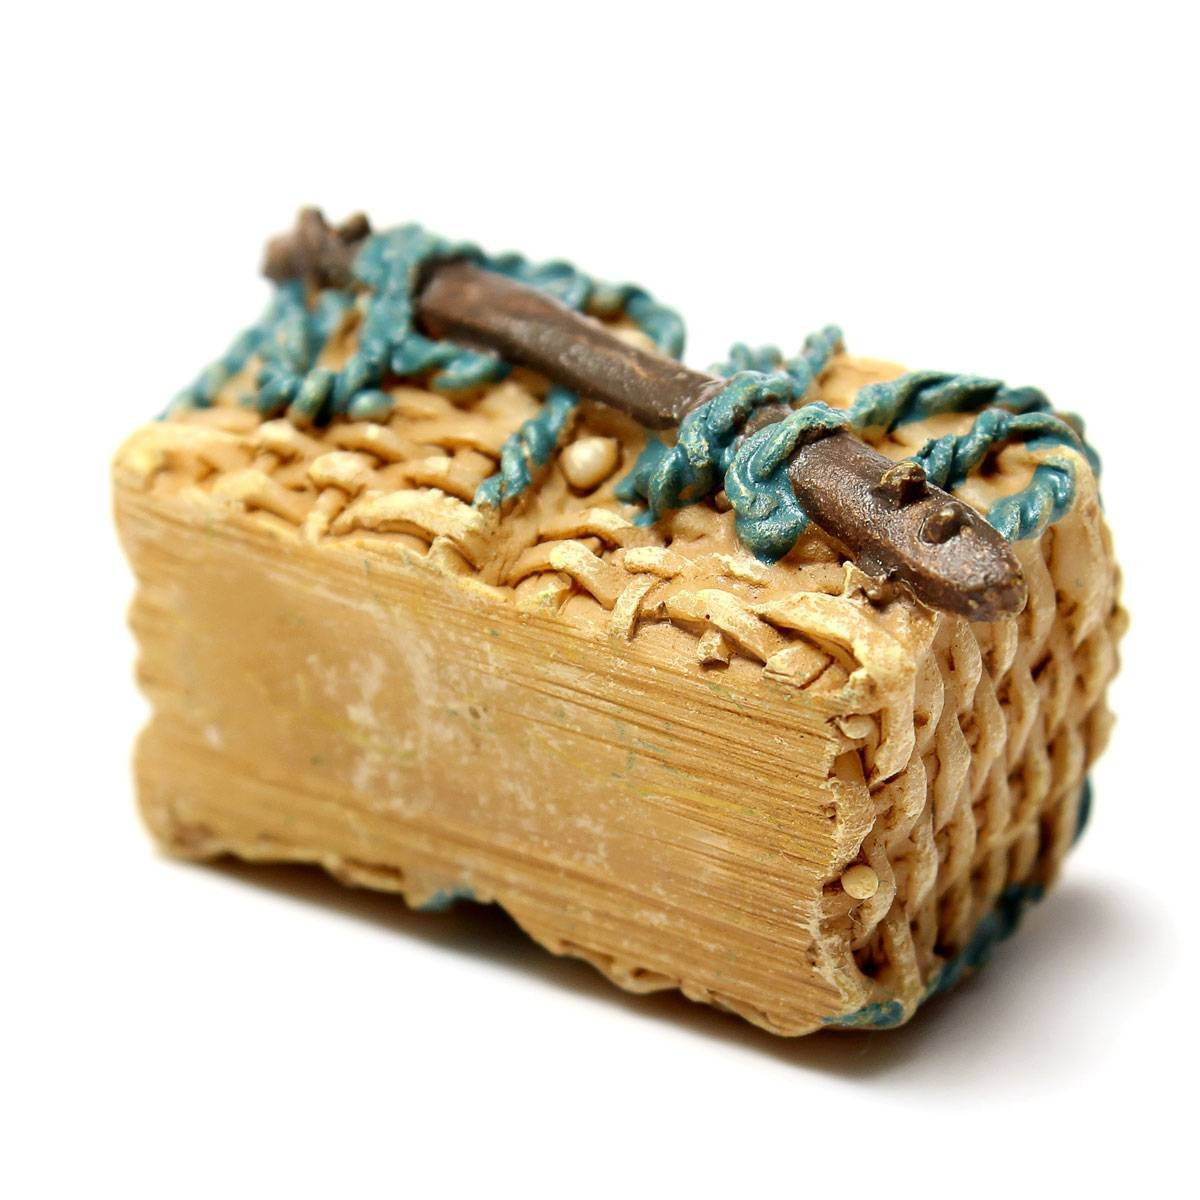 Miniature Dollhouse Ornament Pot Plant Craft Home Decor Wicker Gift Baskets AD